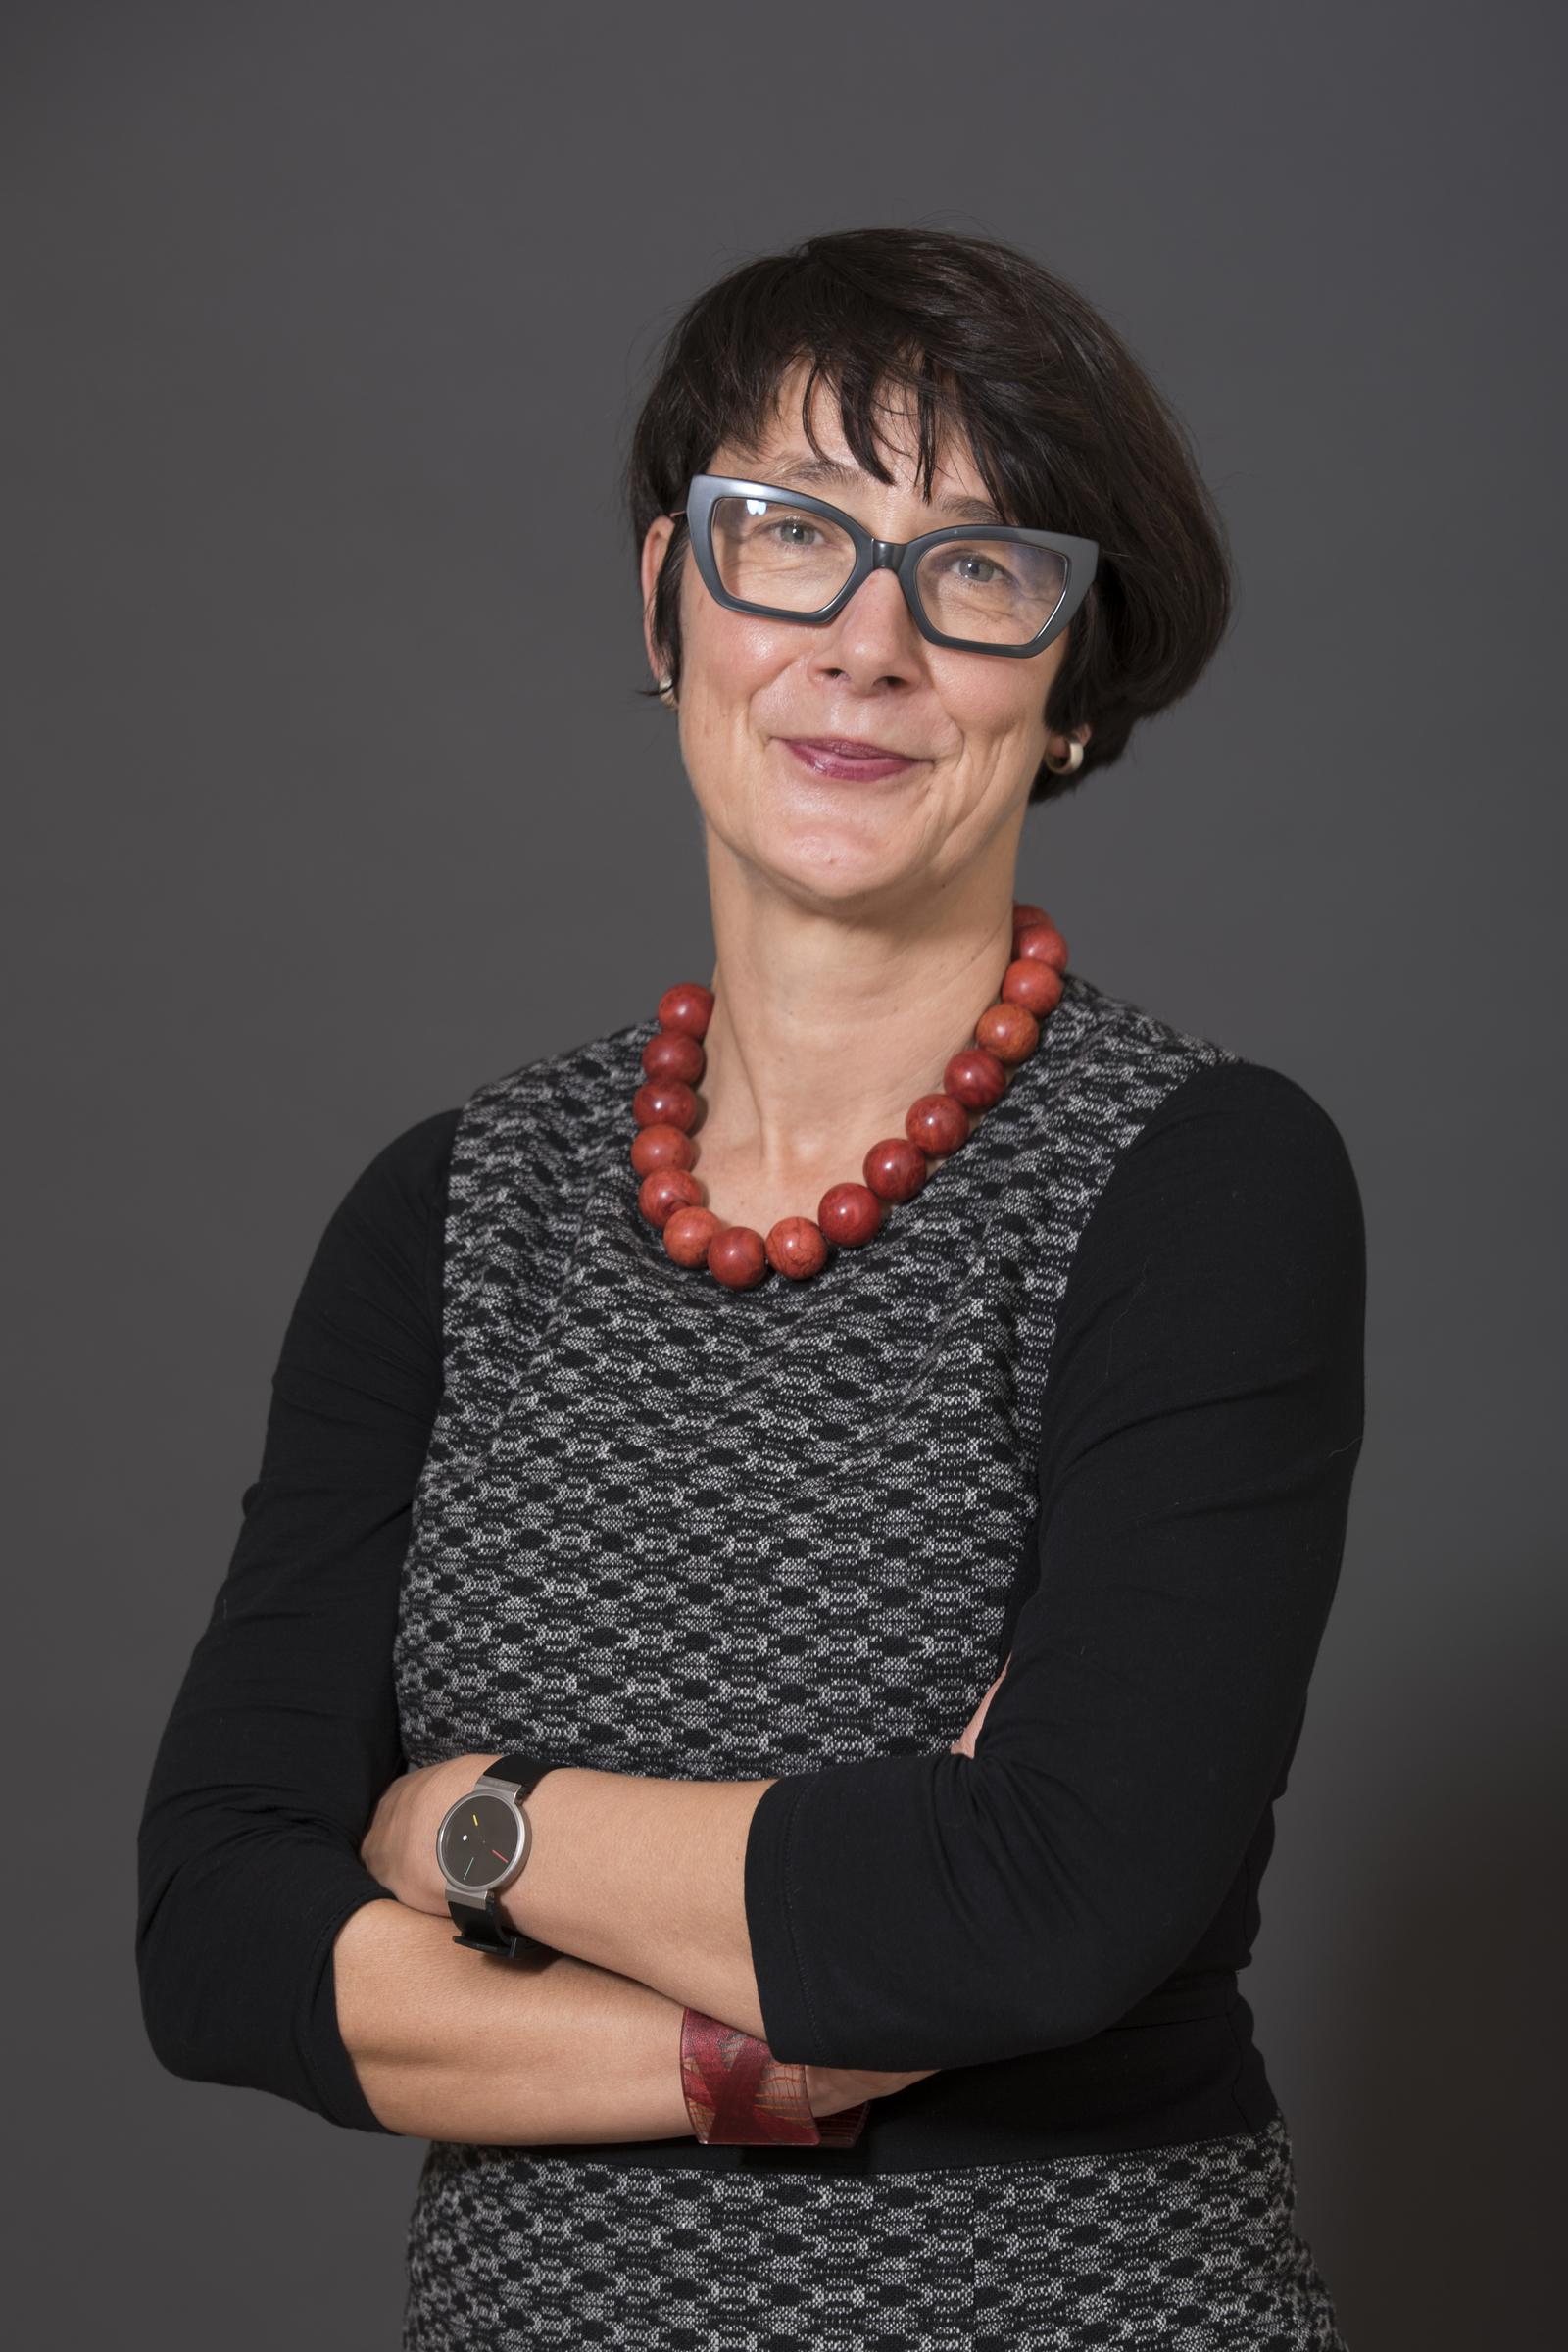 Susanne Luhmann